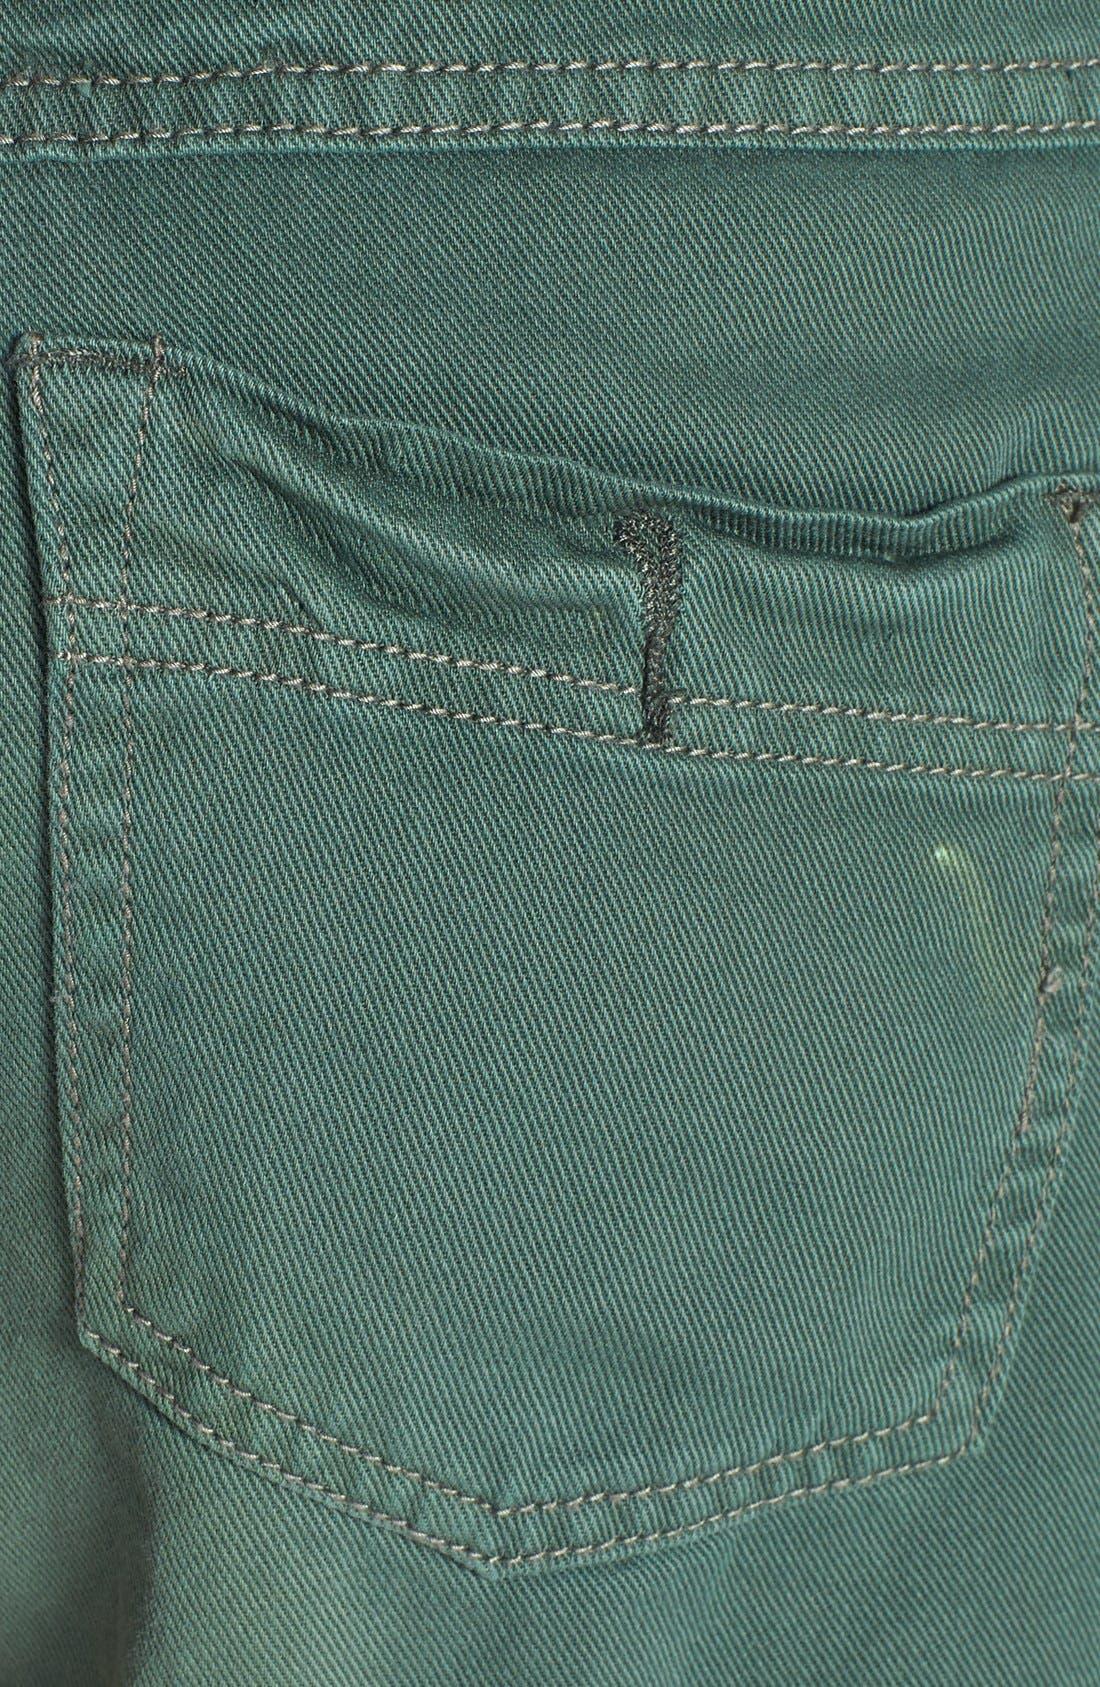 'Dolphin' Cutoff Denim Shorts,                             Alternate thumbnail 11, color,